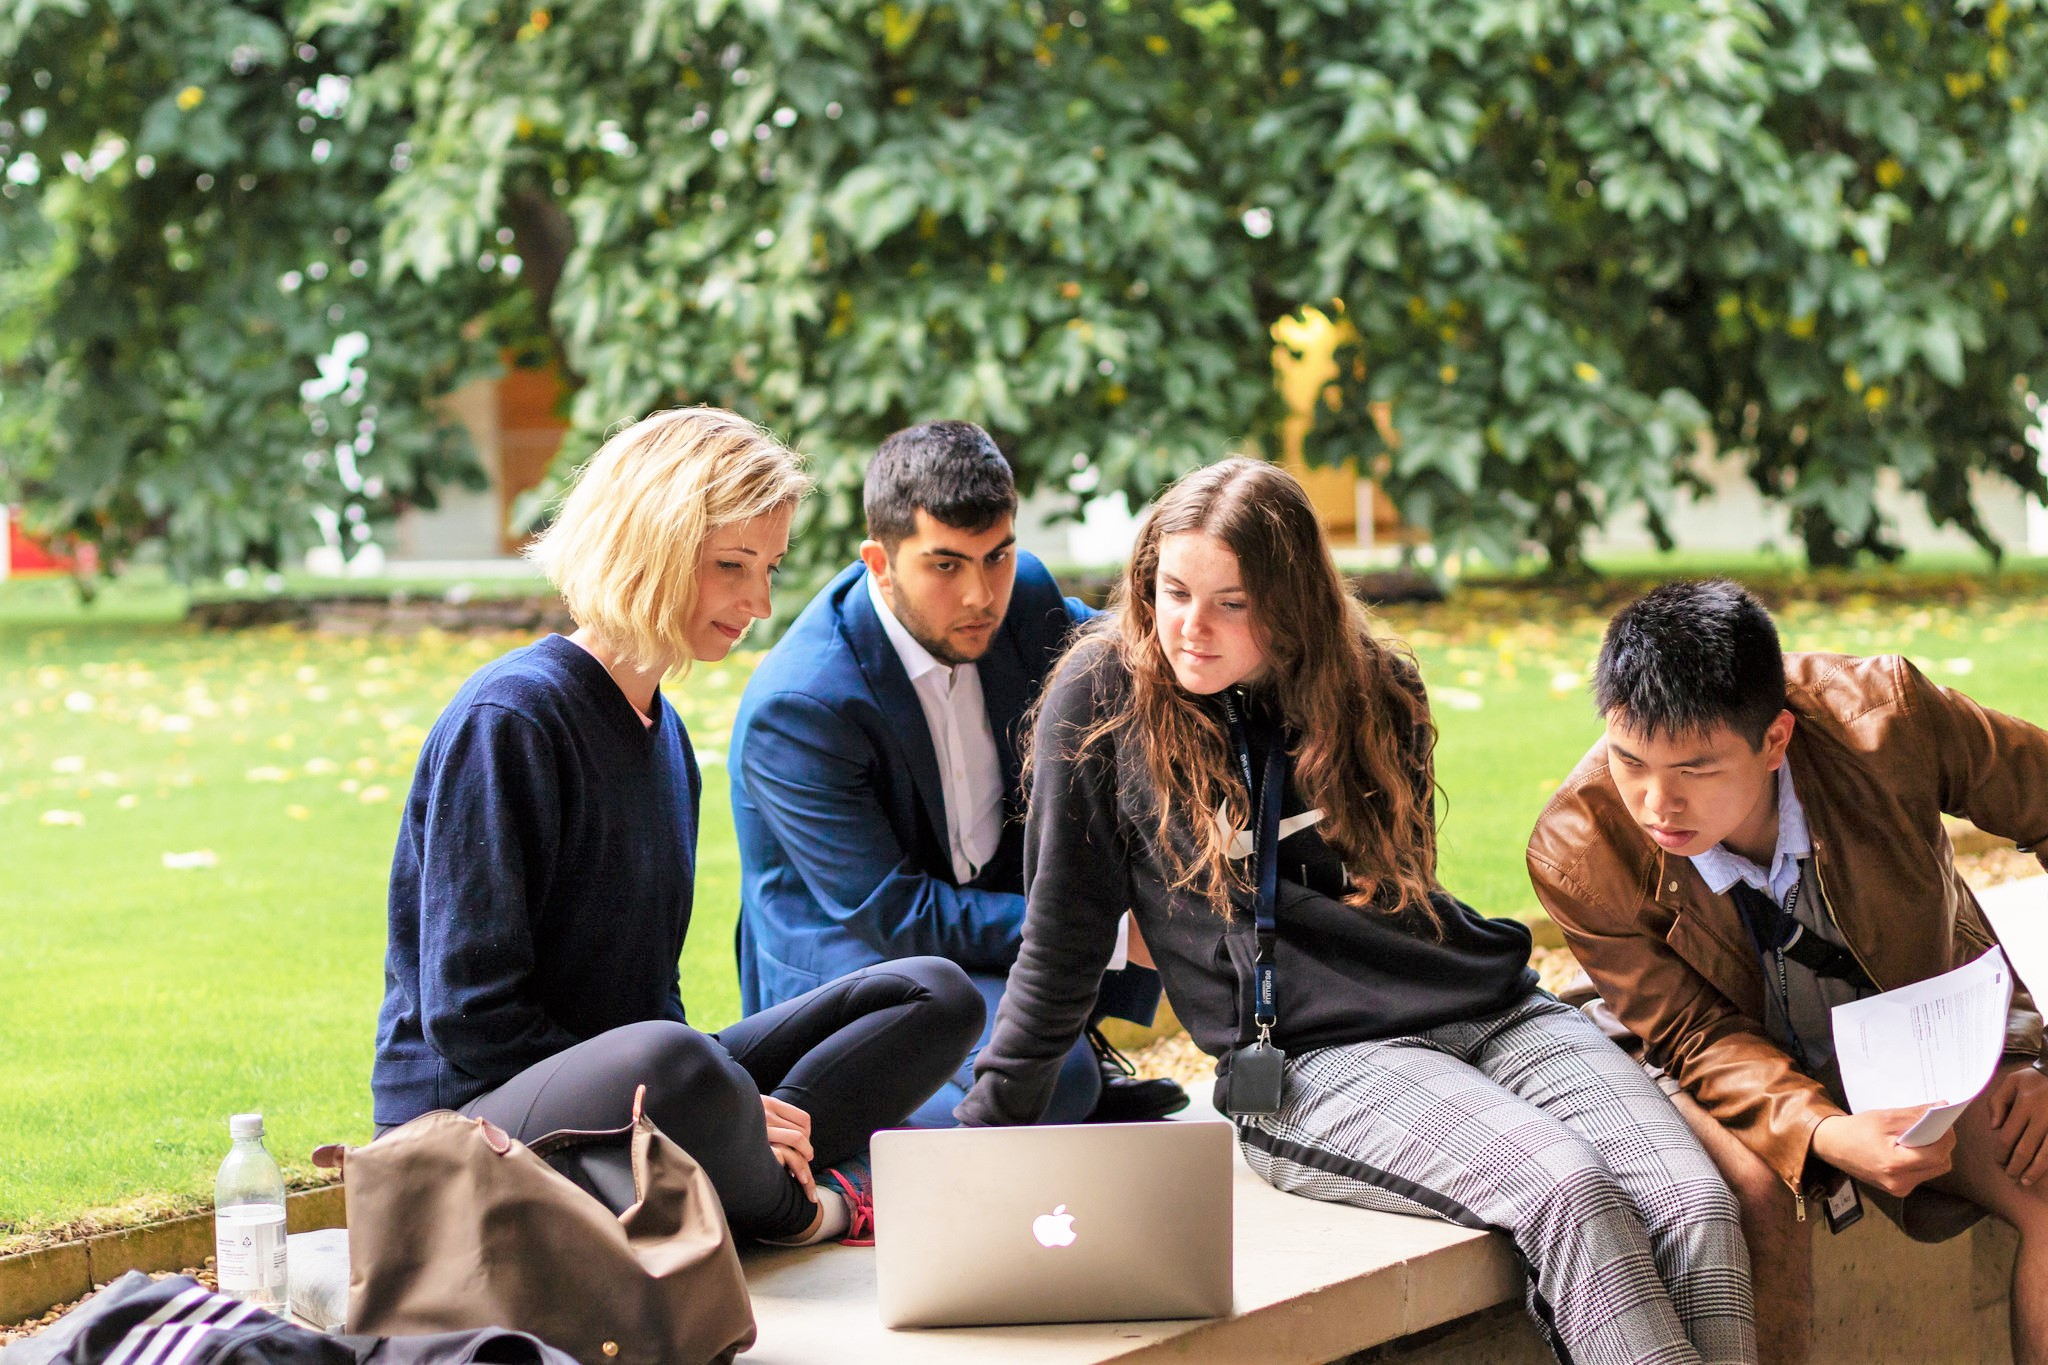 International Relations Summer School in Oxford